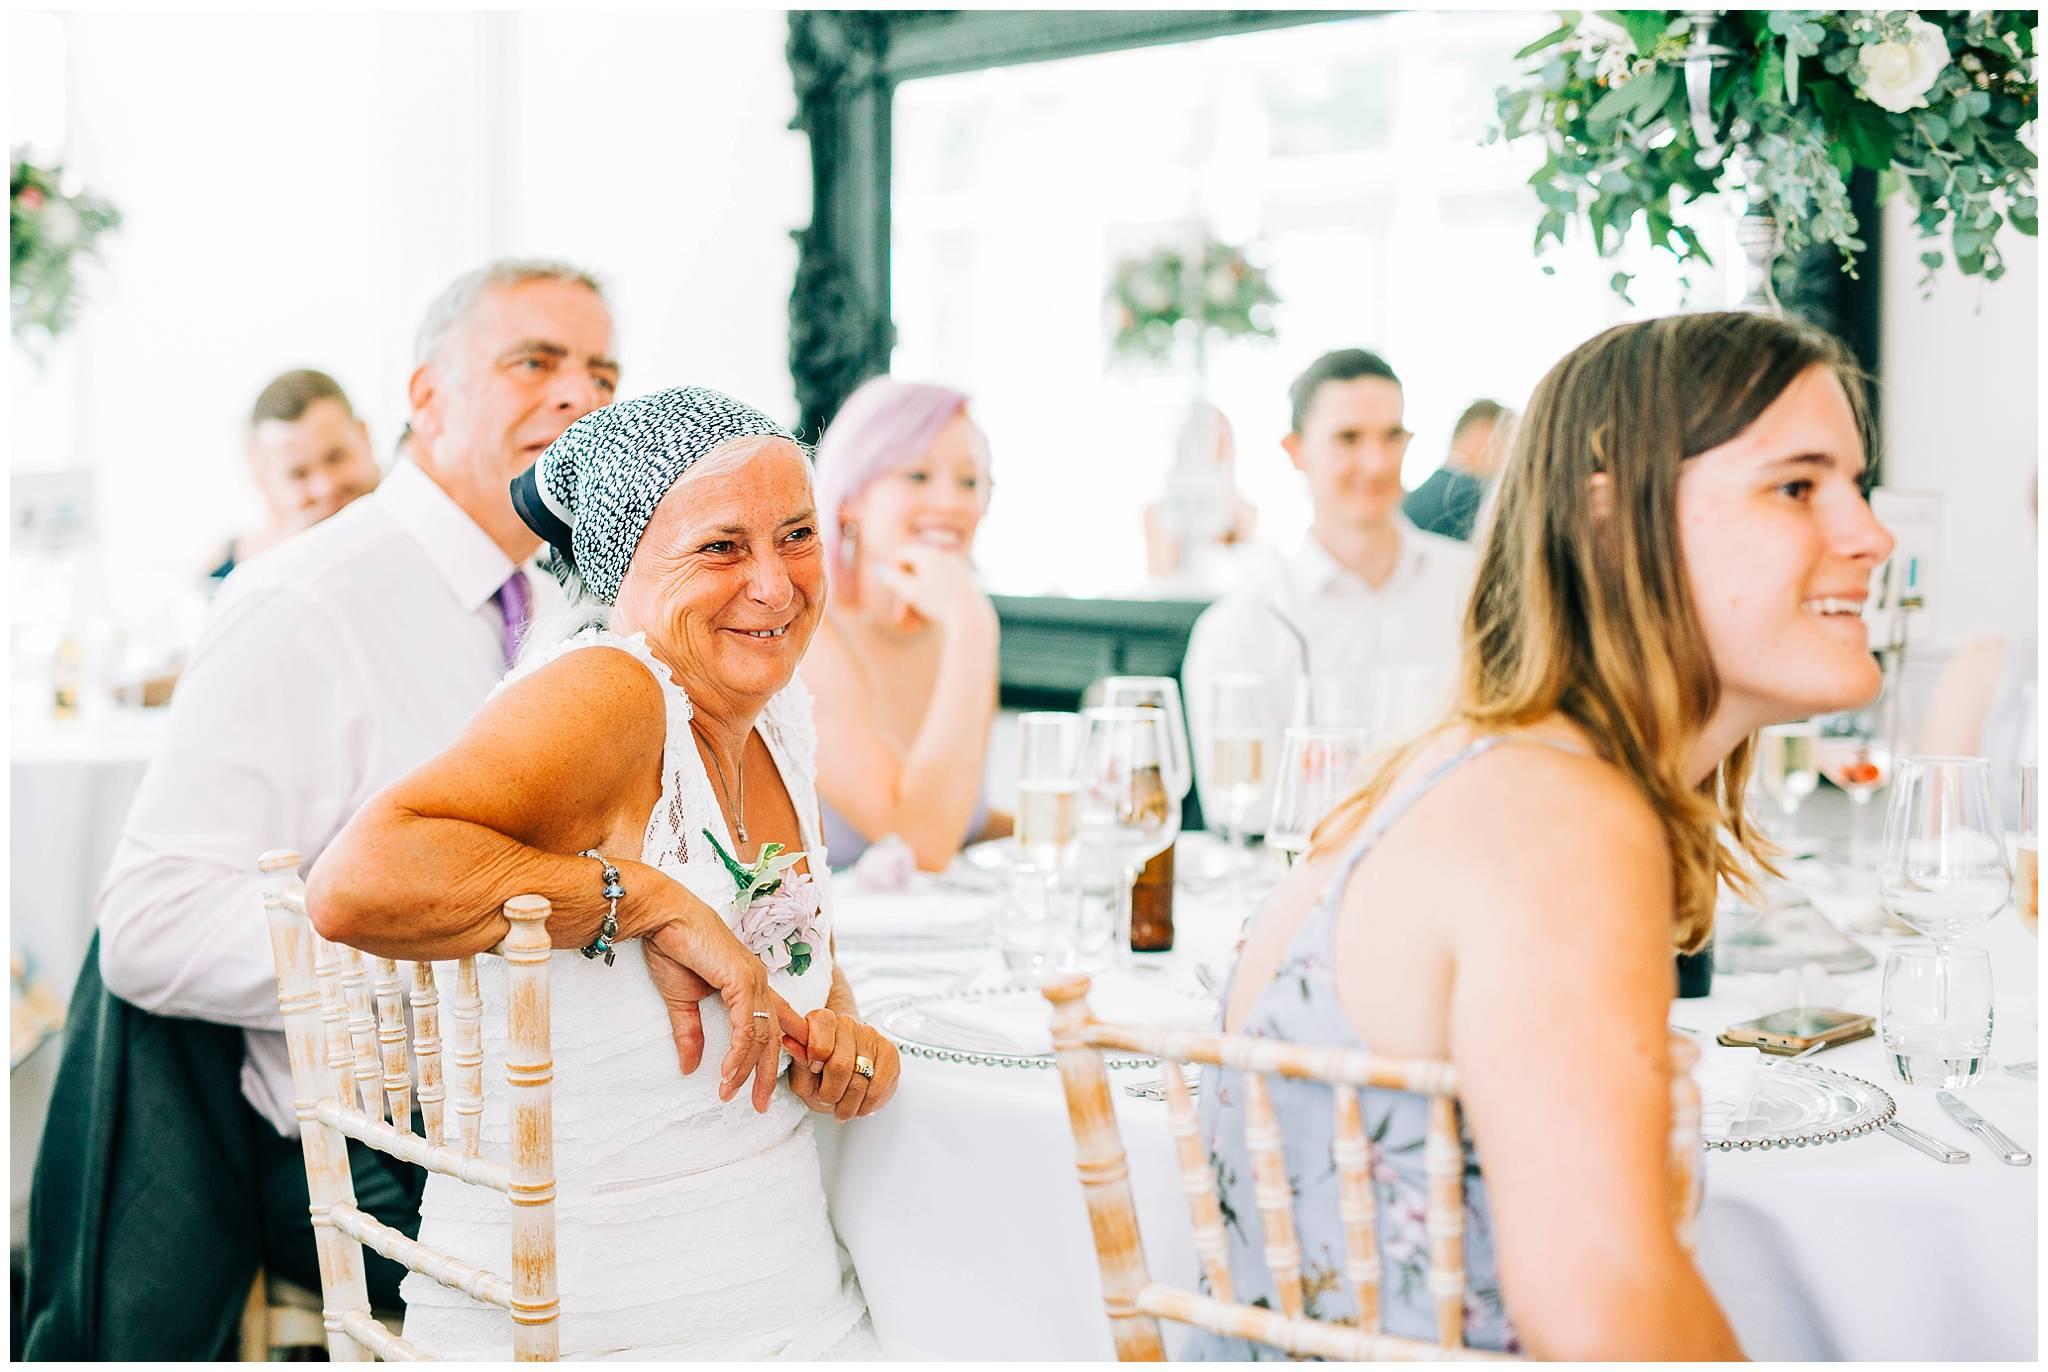 Summer Garden Wedding - The Old Vicarage Boutique Hotel66.jpg